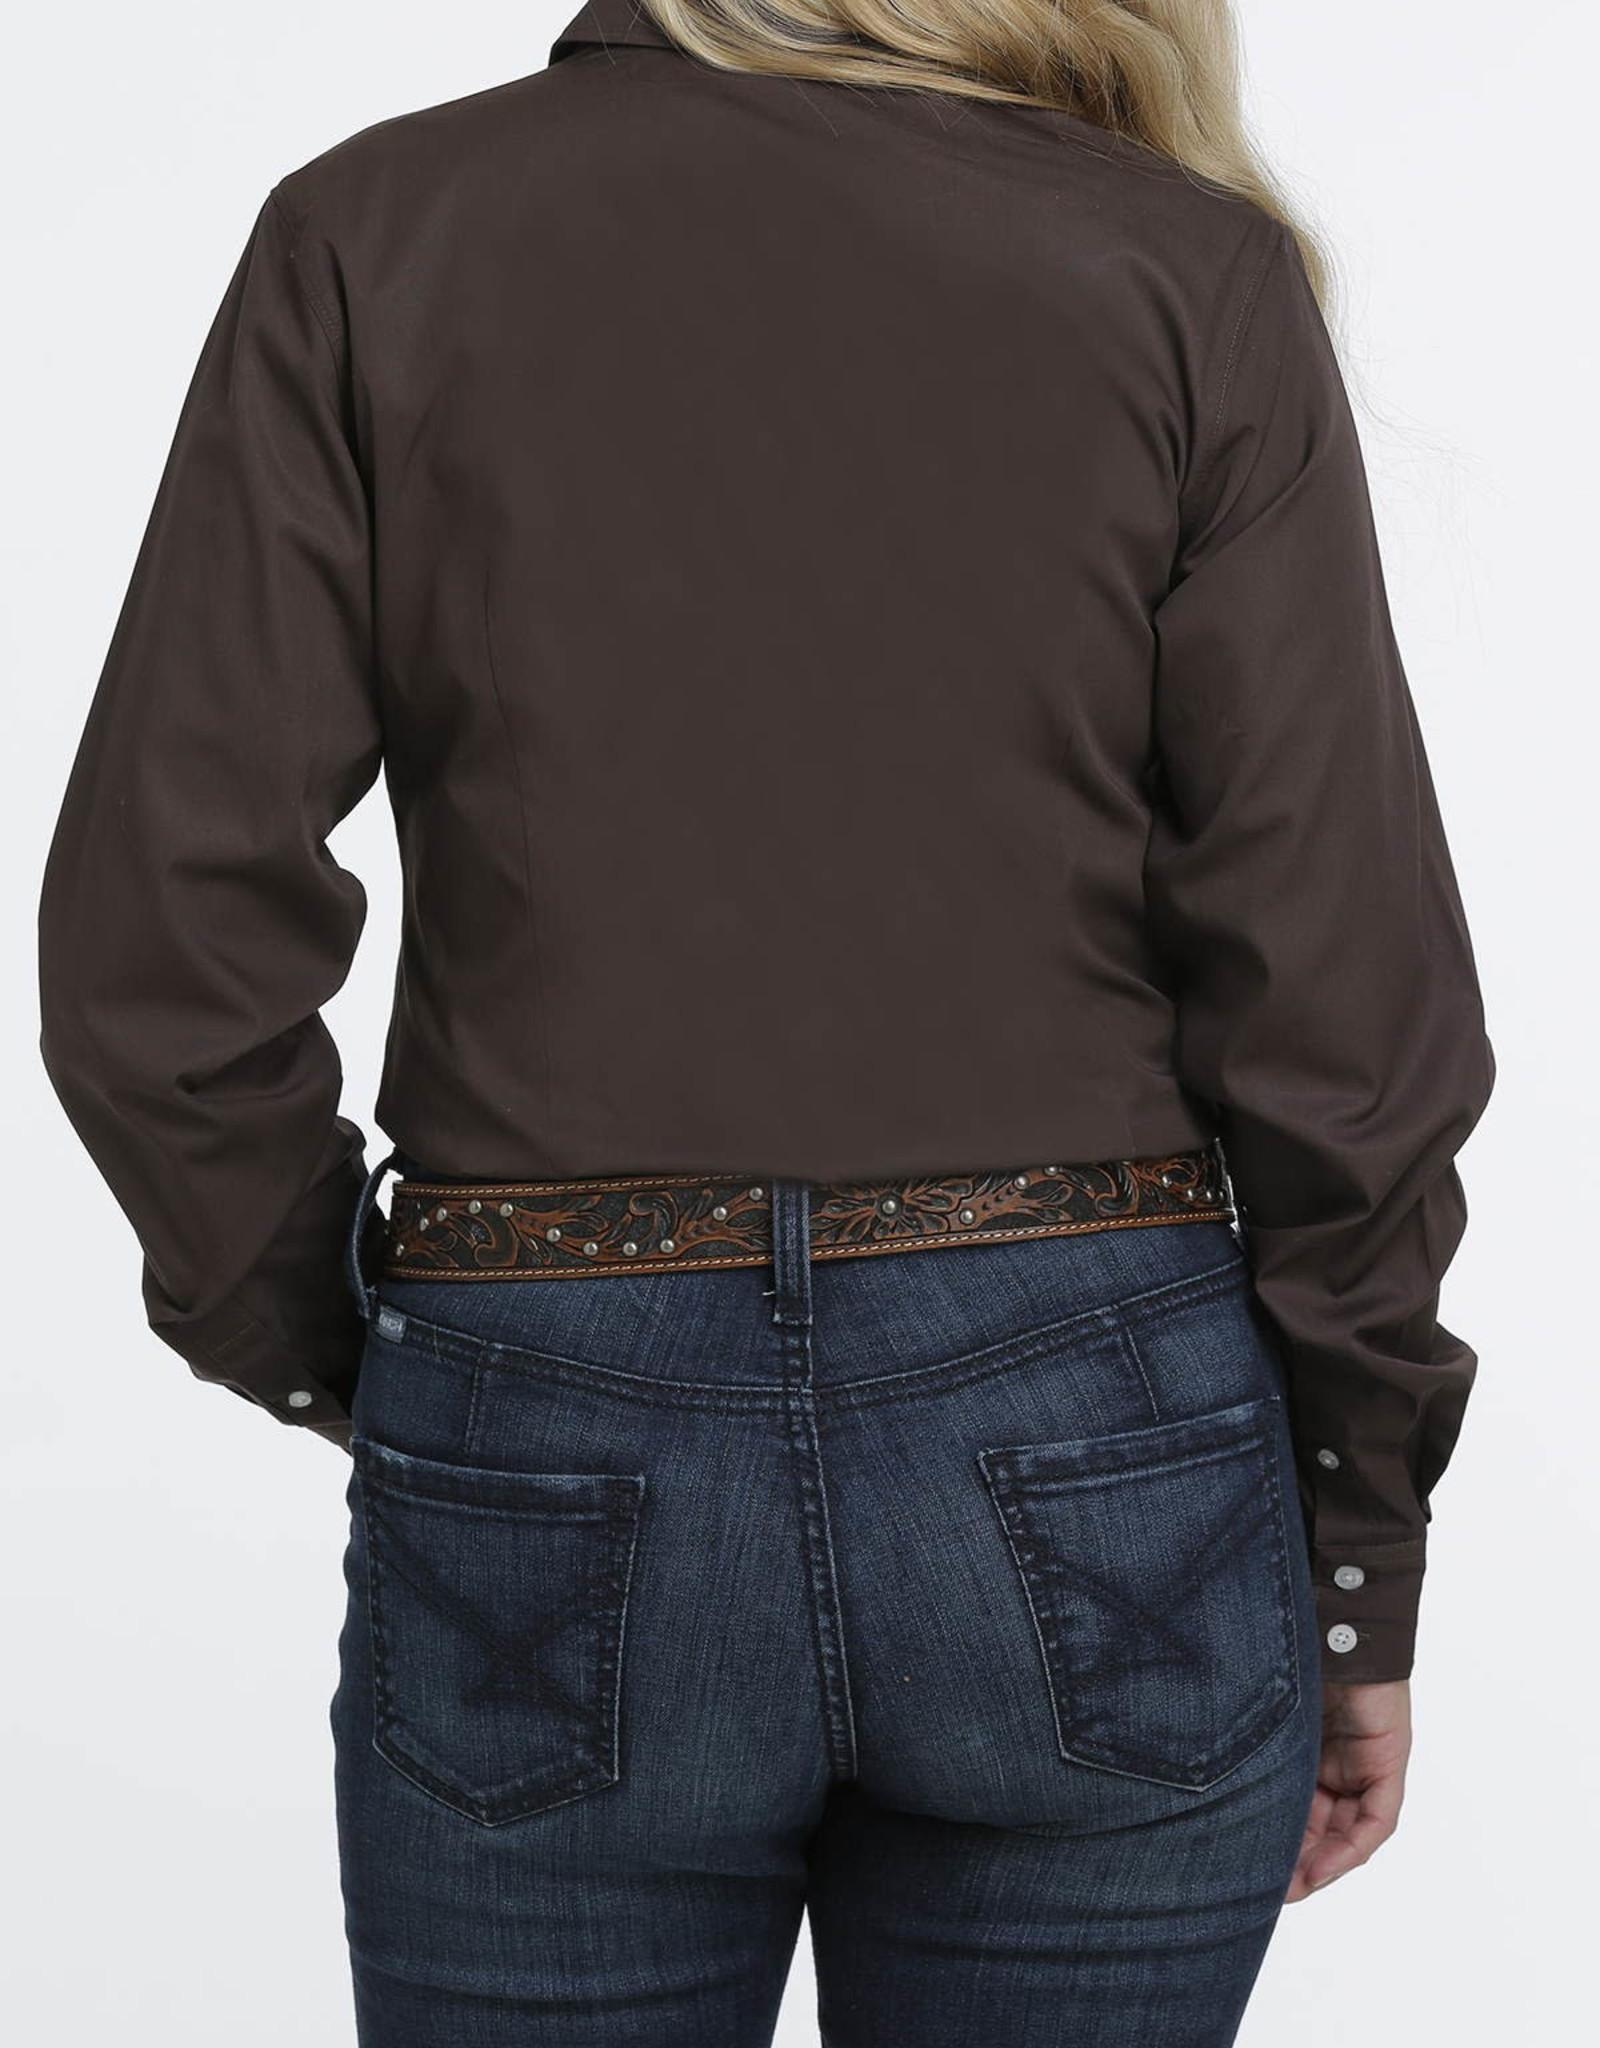 Cinch Cinch Womens Solid Chocolate Brown Western Button Down Shirt